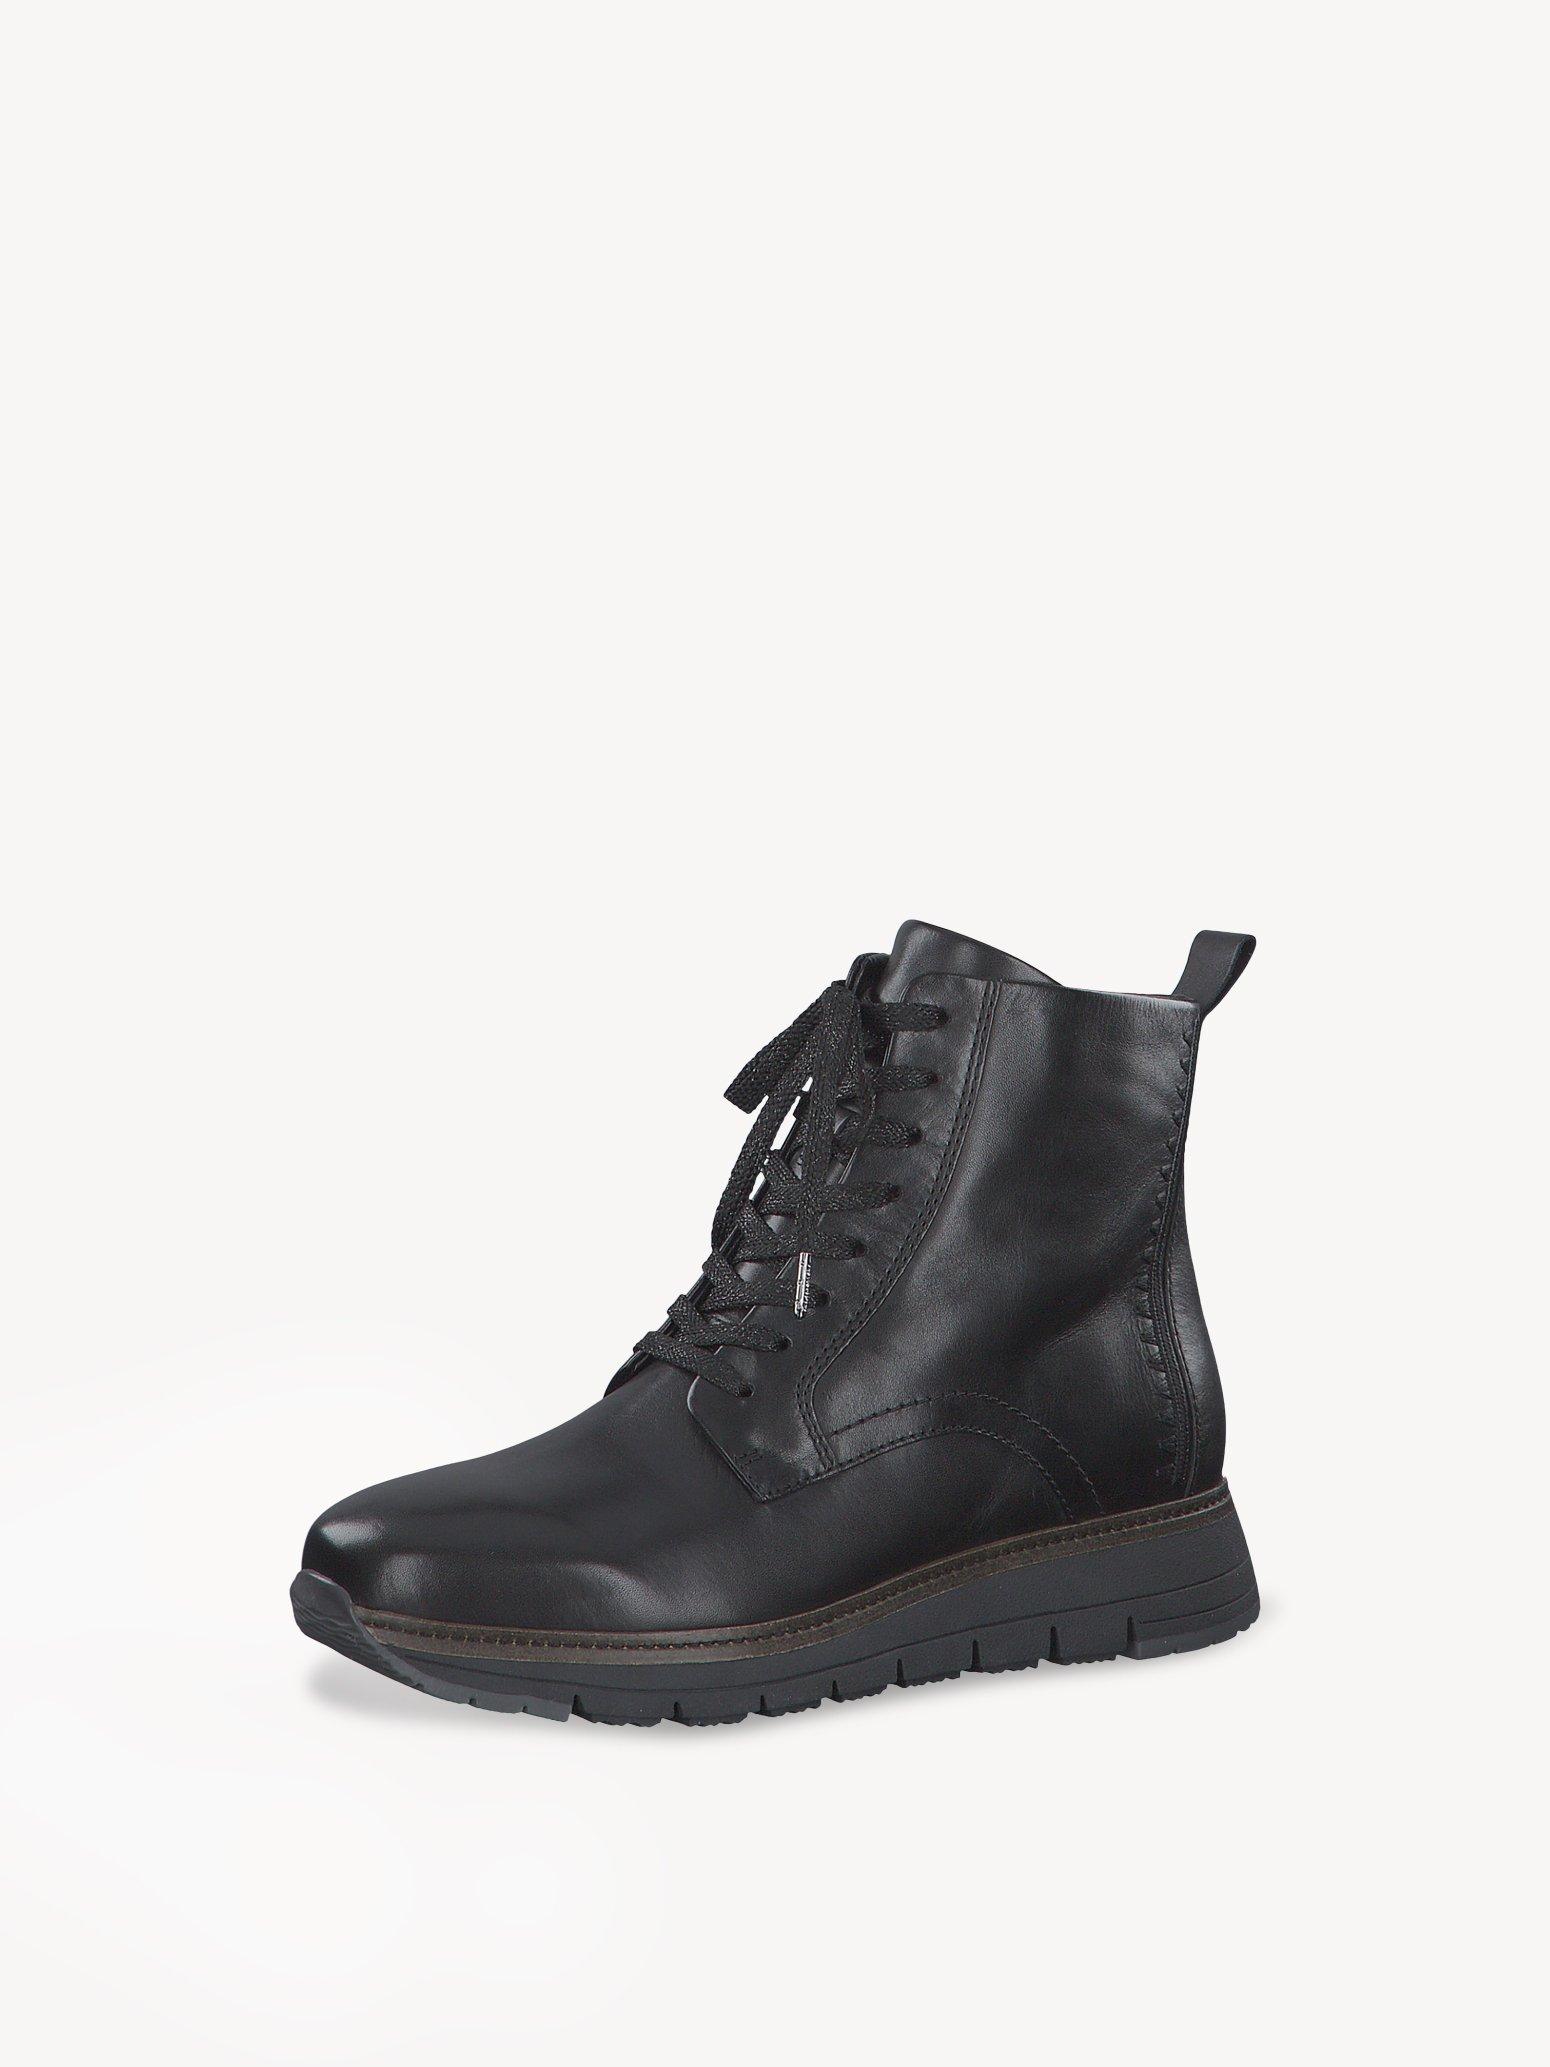 Ботинки Tamaris 1-1-25256-25-003